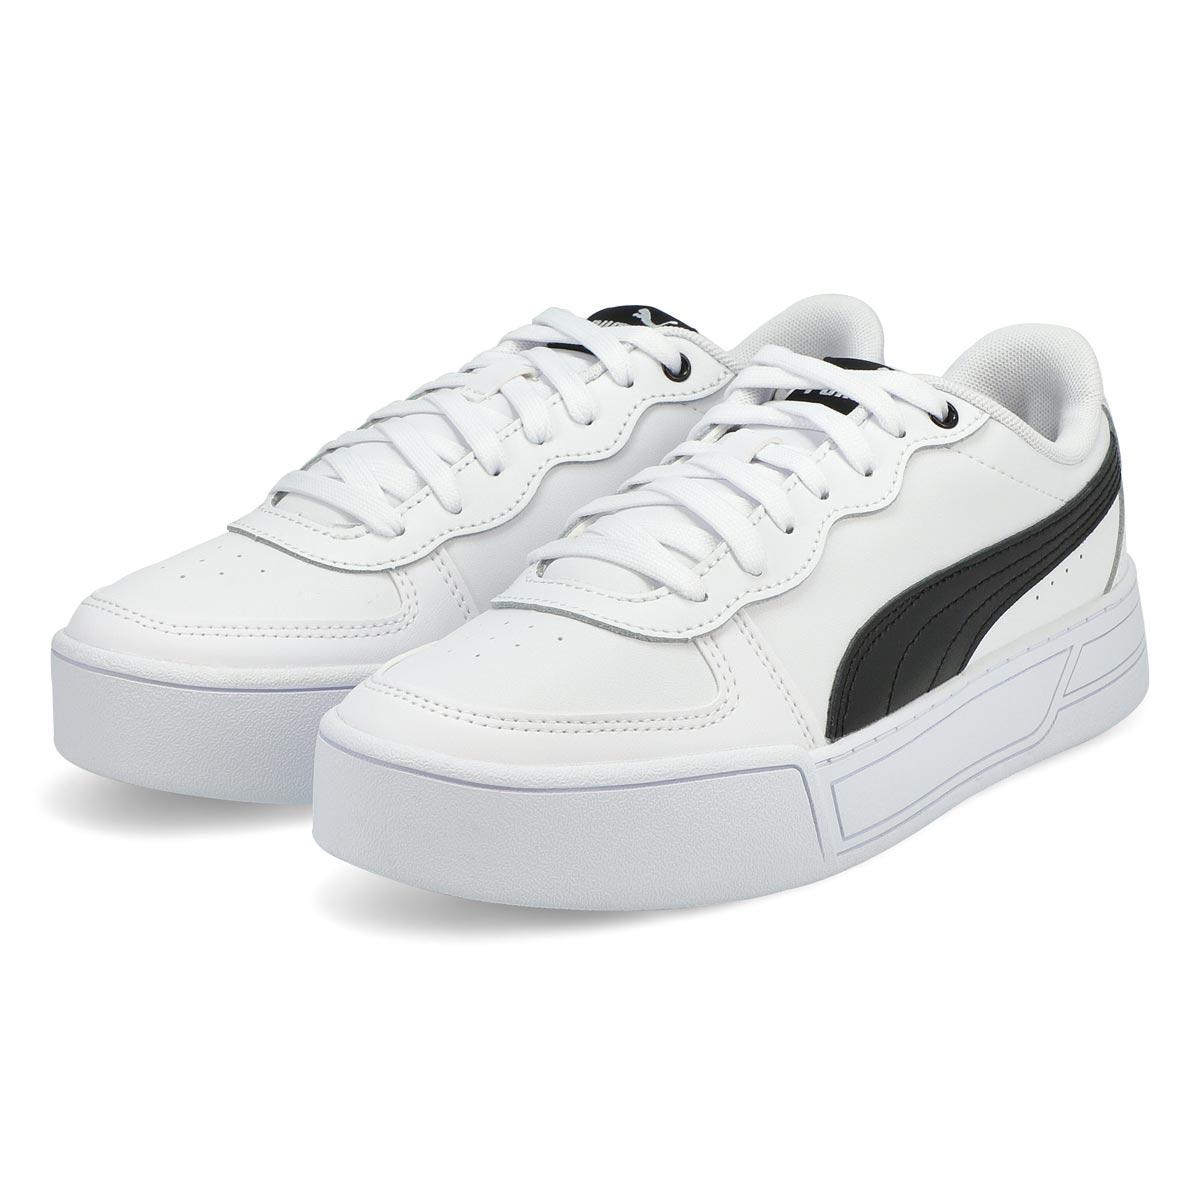 Women's Puma Skye Sneaker - White/Black